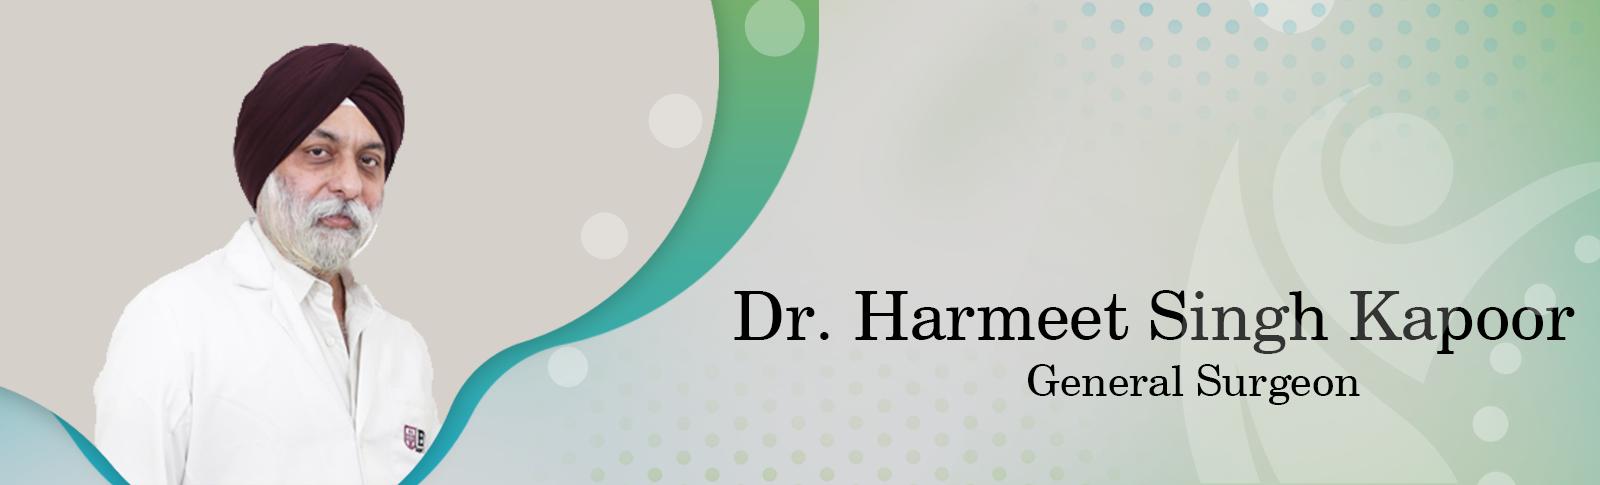 Dr. Harmeet Kapoor